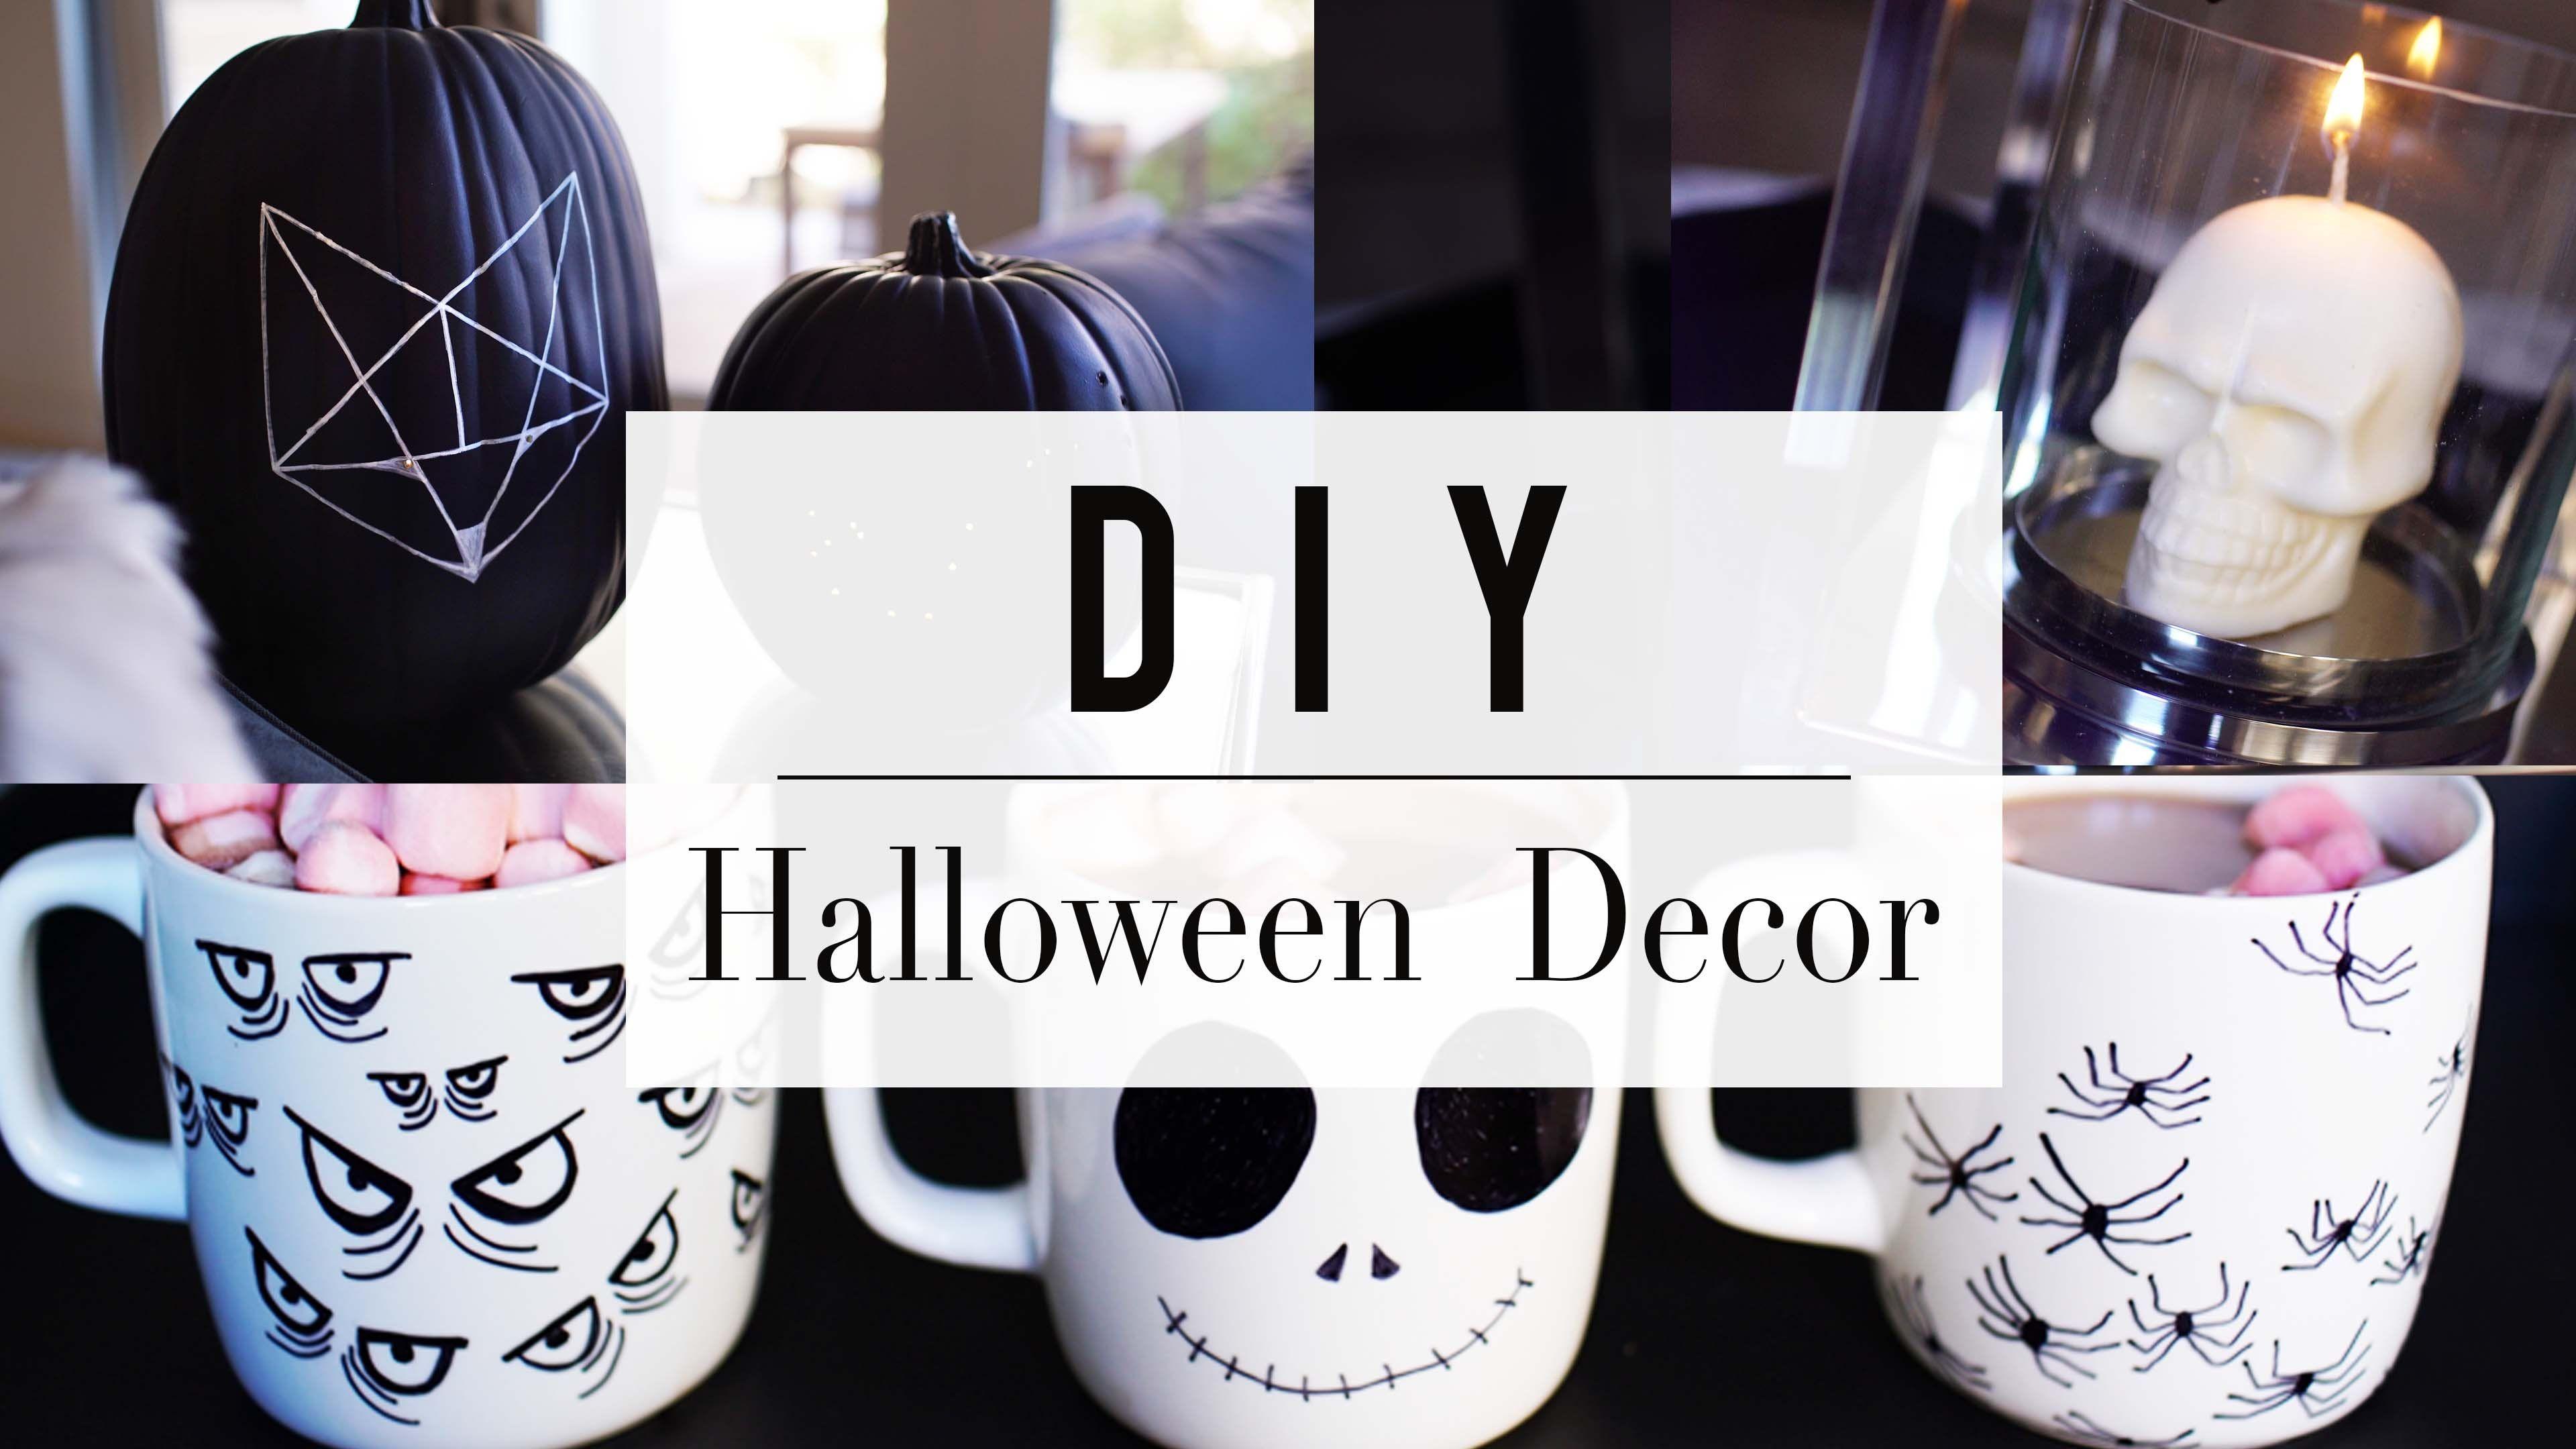 Hey guys! Halloween is right around the corner and I have 3 great Halloween DIYs…